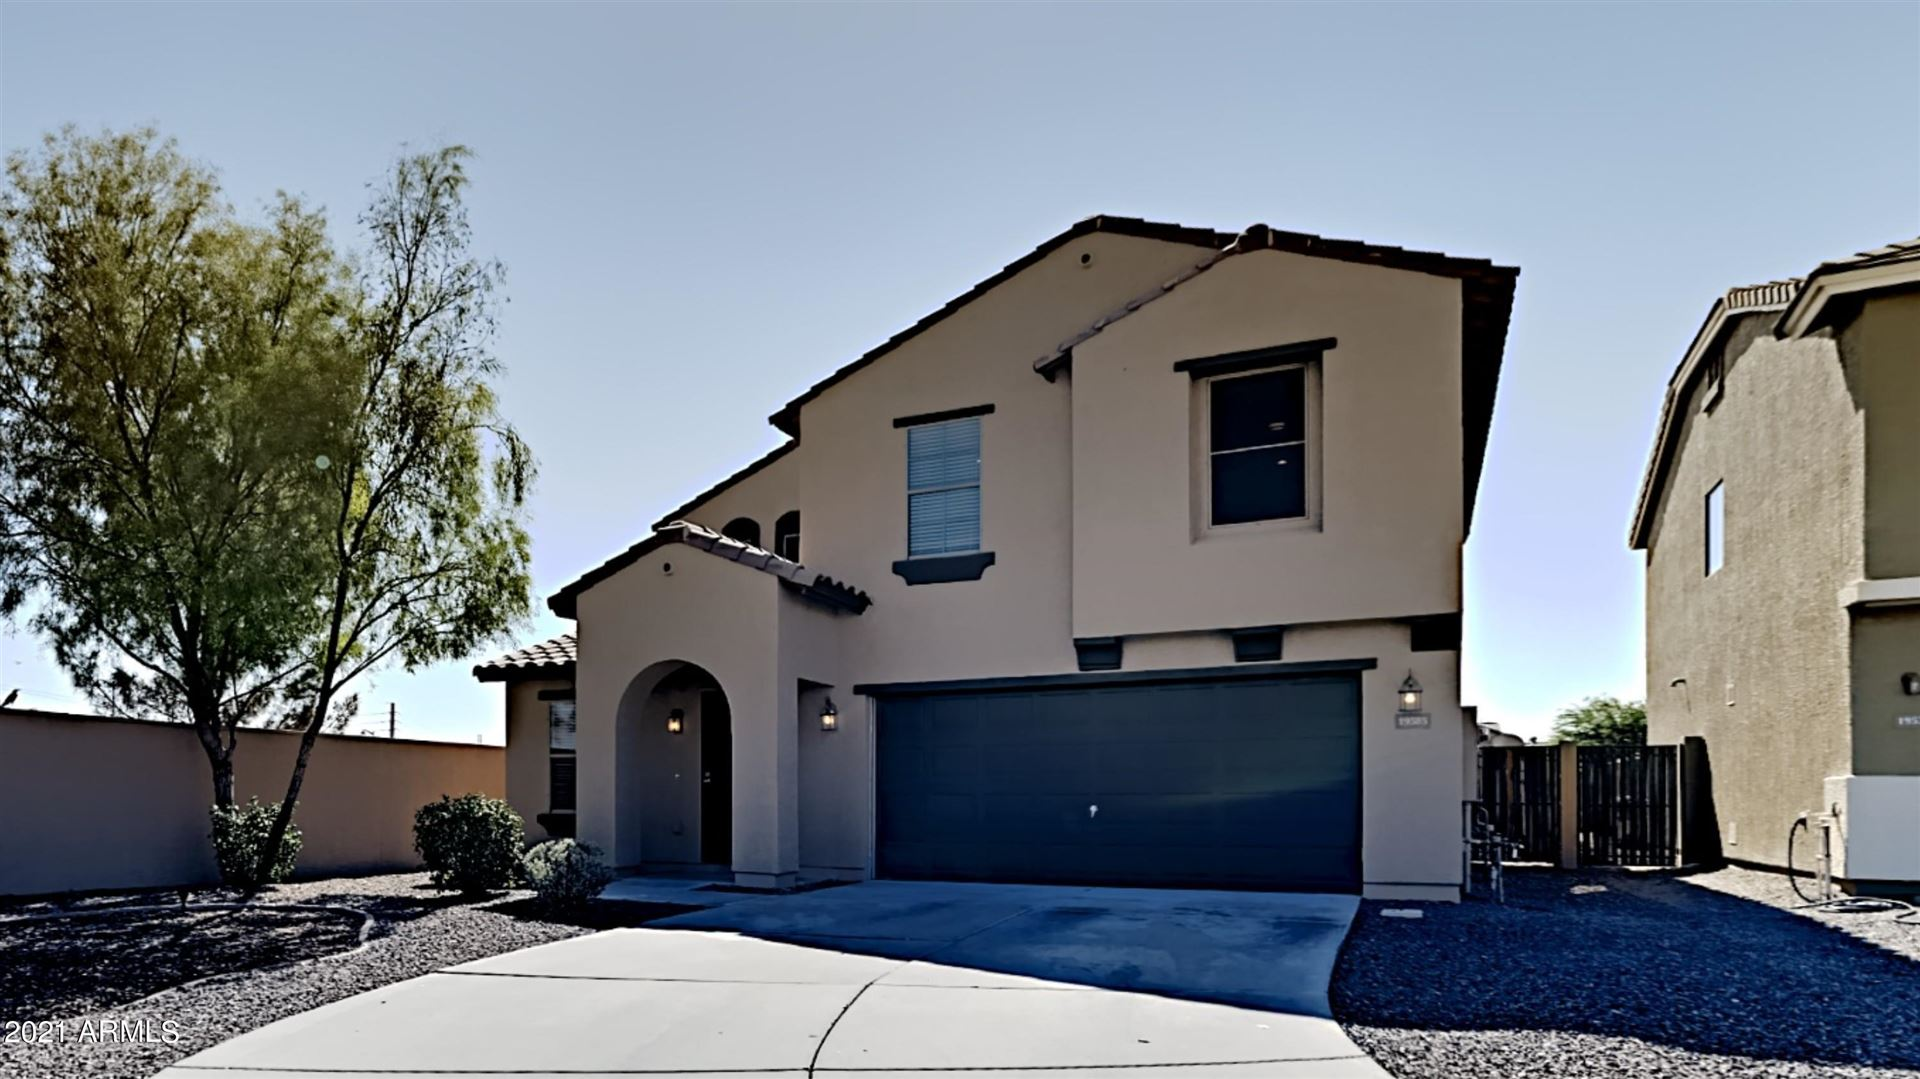 Photo for 19585 N SANDALWOOD Drive, Maricopa, AZ 85138 (MLS # 6254603)